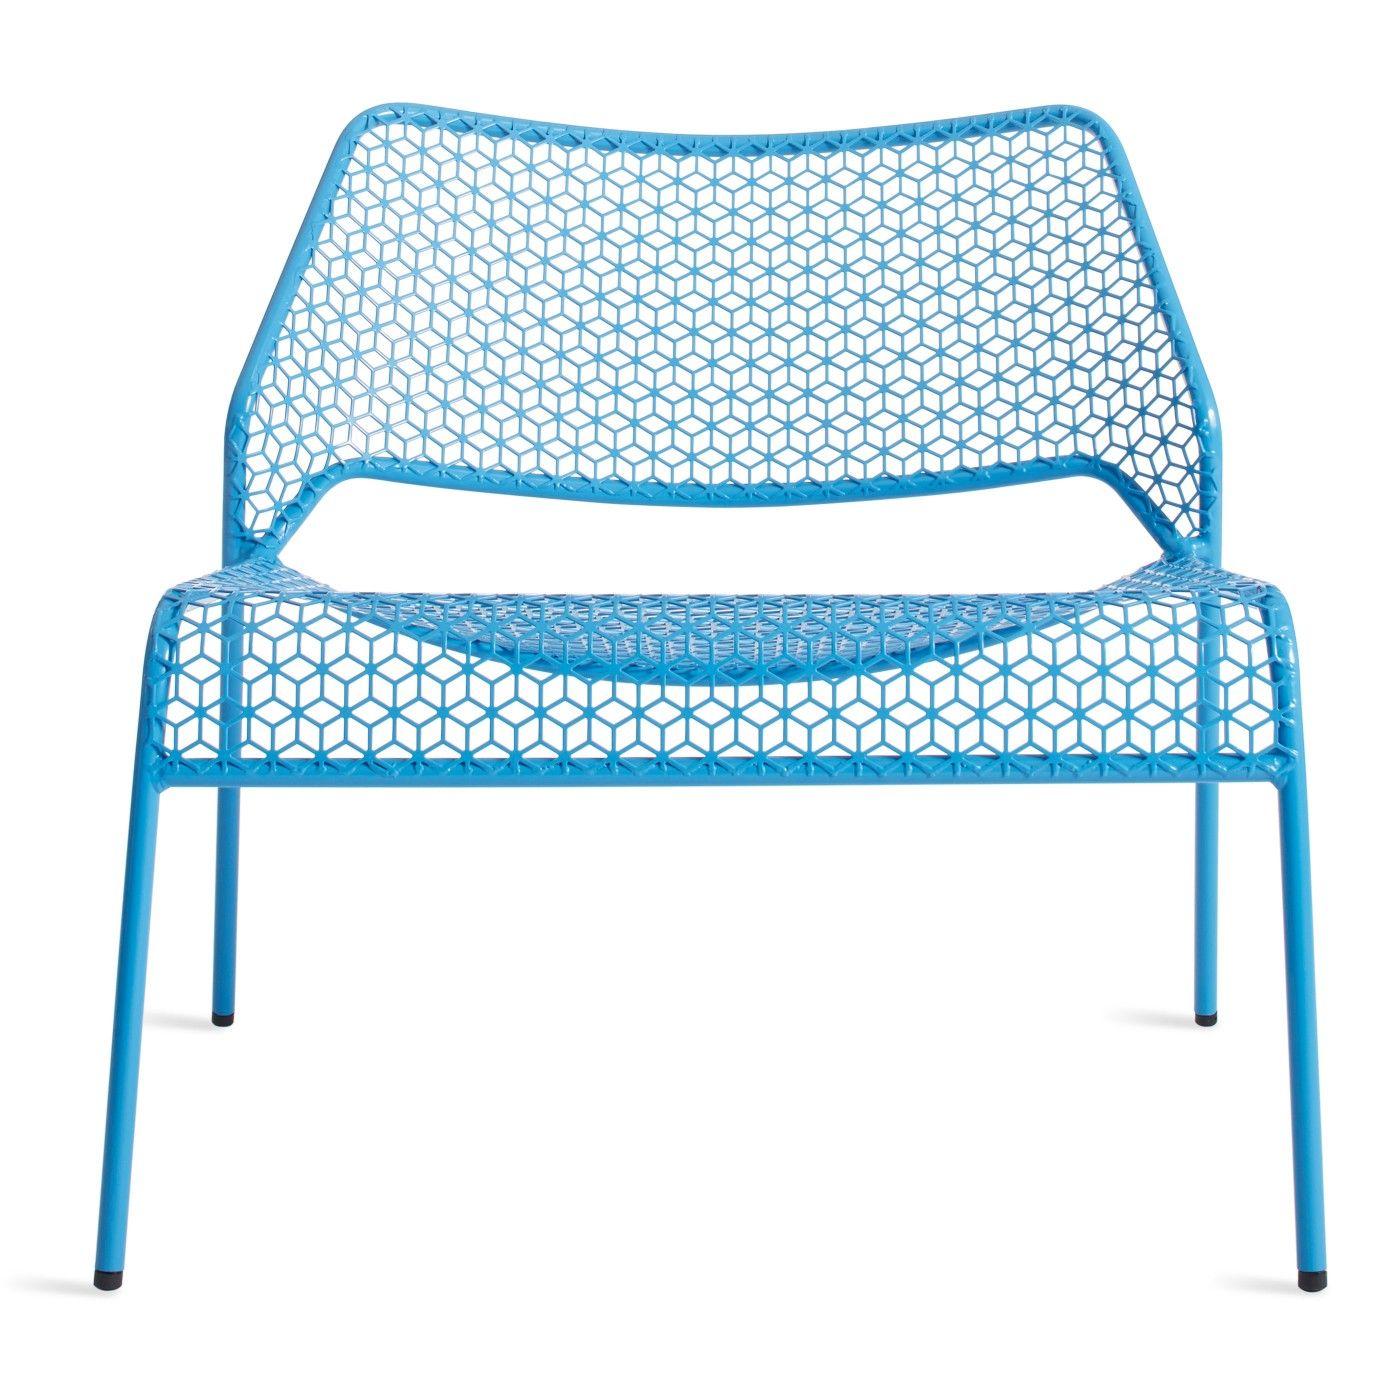 Hot Mesh Lounge Chair - Simple Blue | Patio | Pinterest | Lounge ...